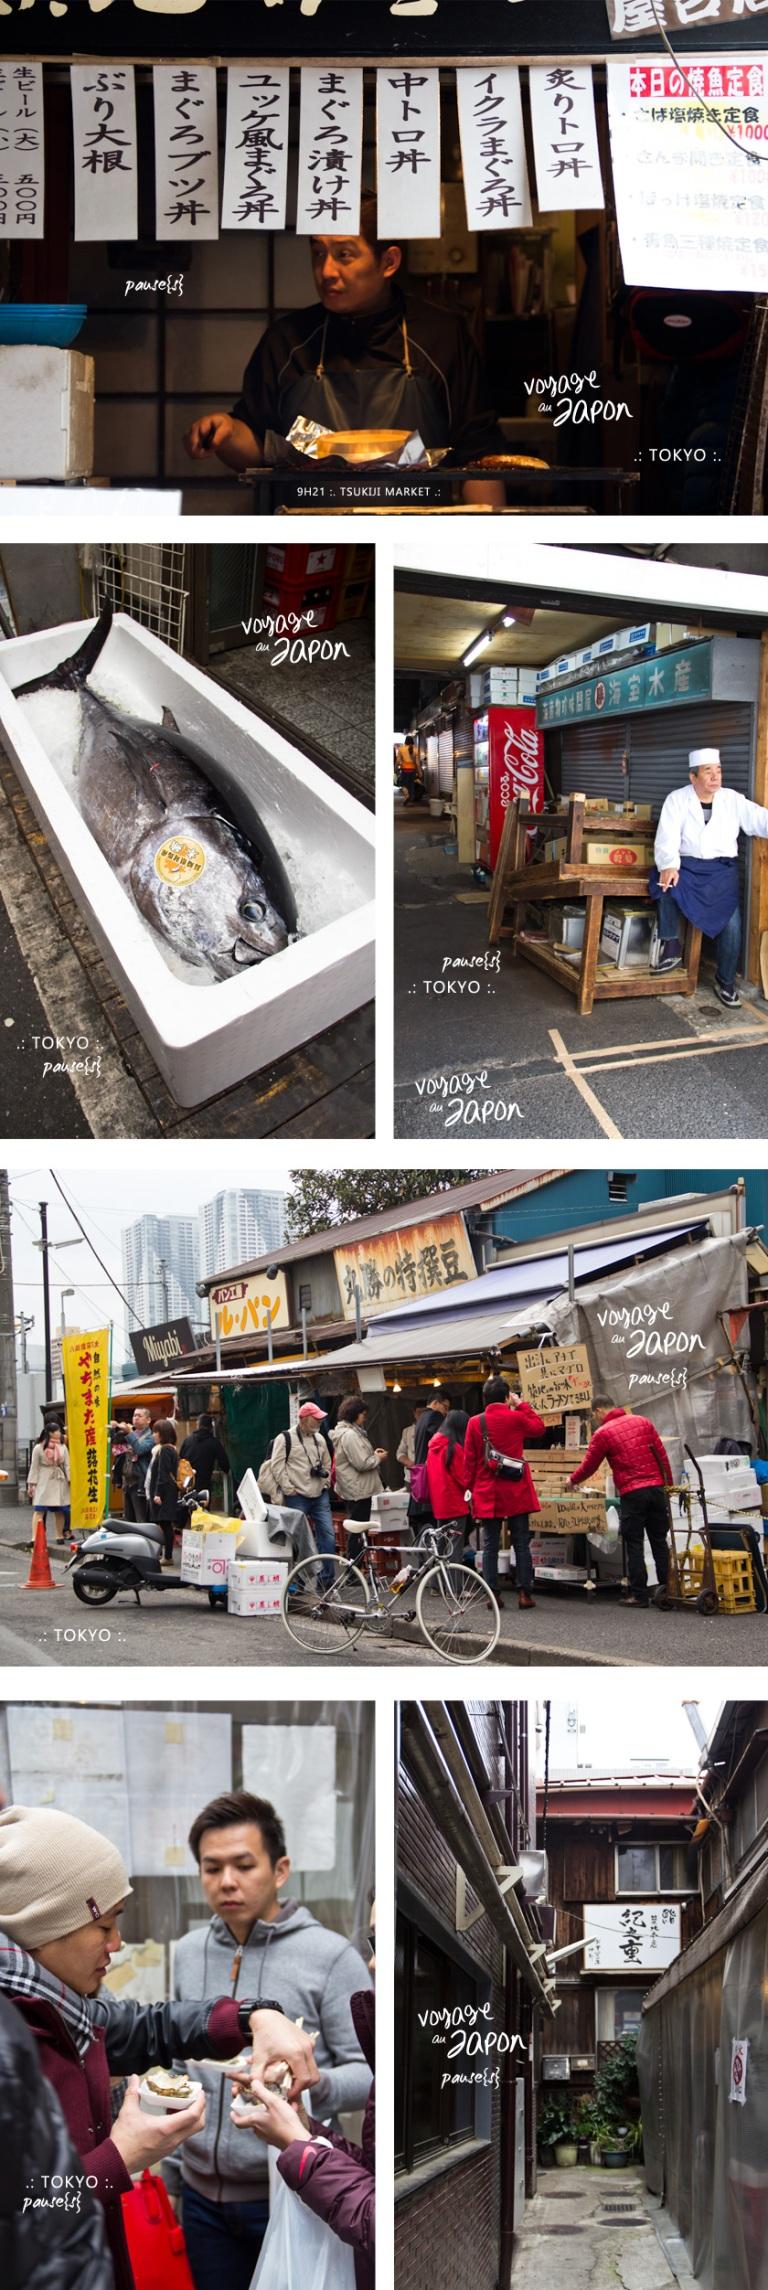 marche-poisson-tokyo-03